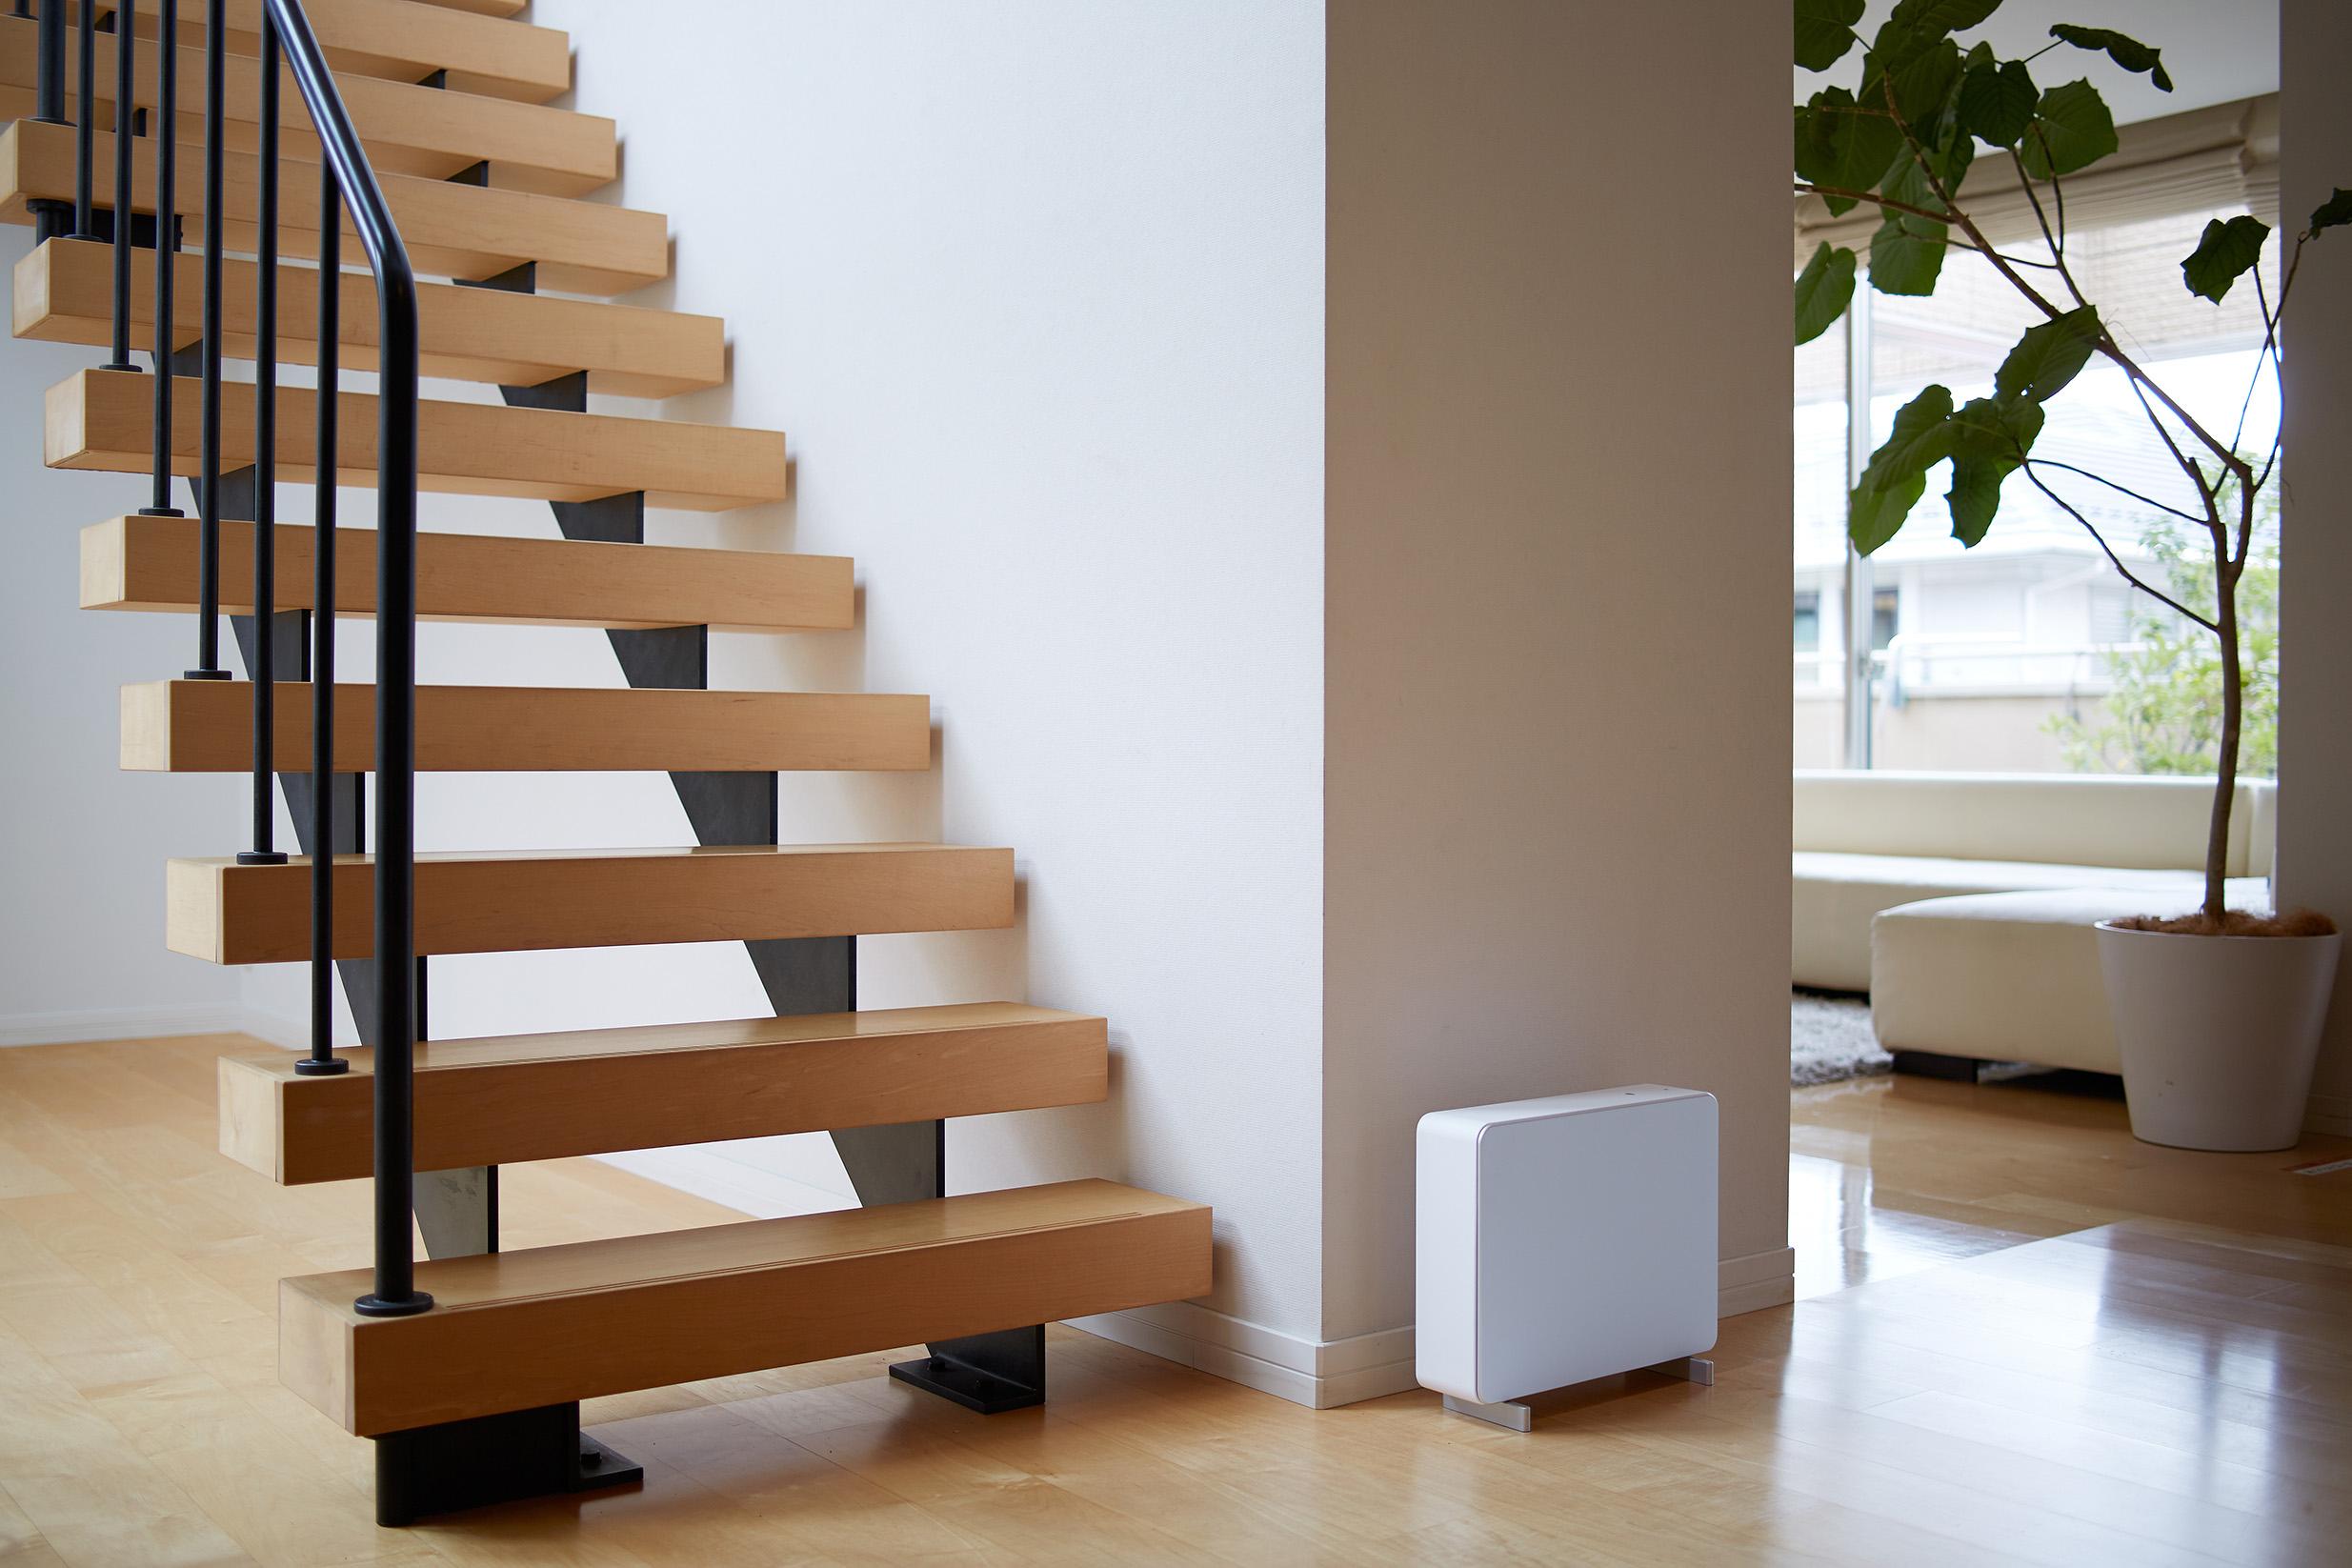 turkel_design_modern_prefab_home_partners_ataroma.JPG